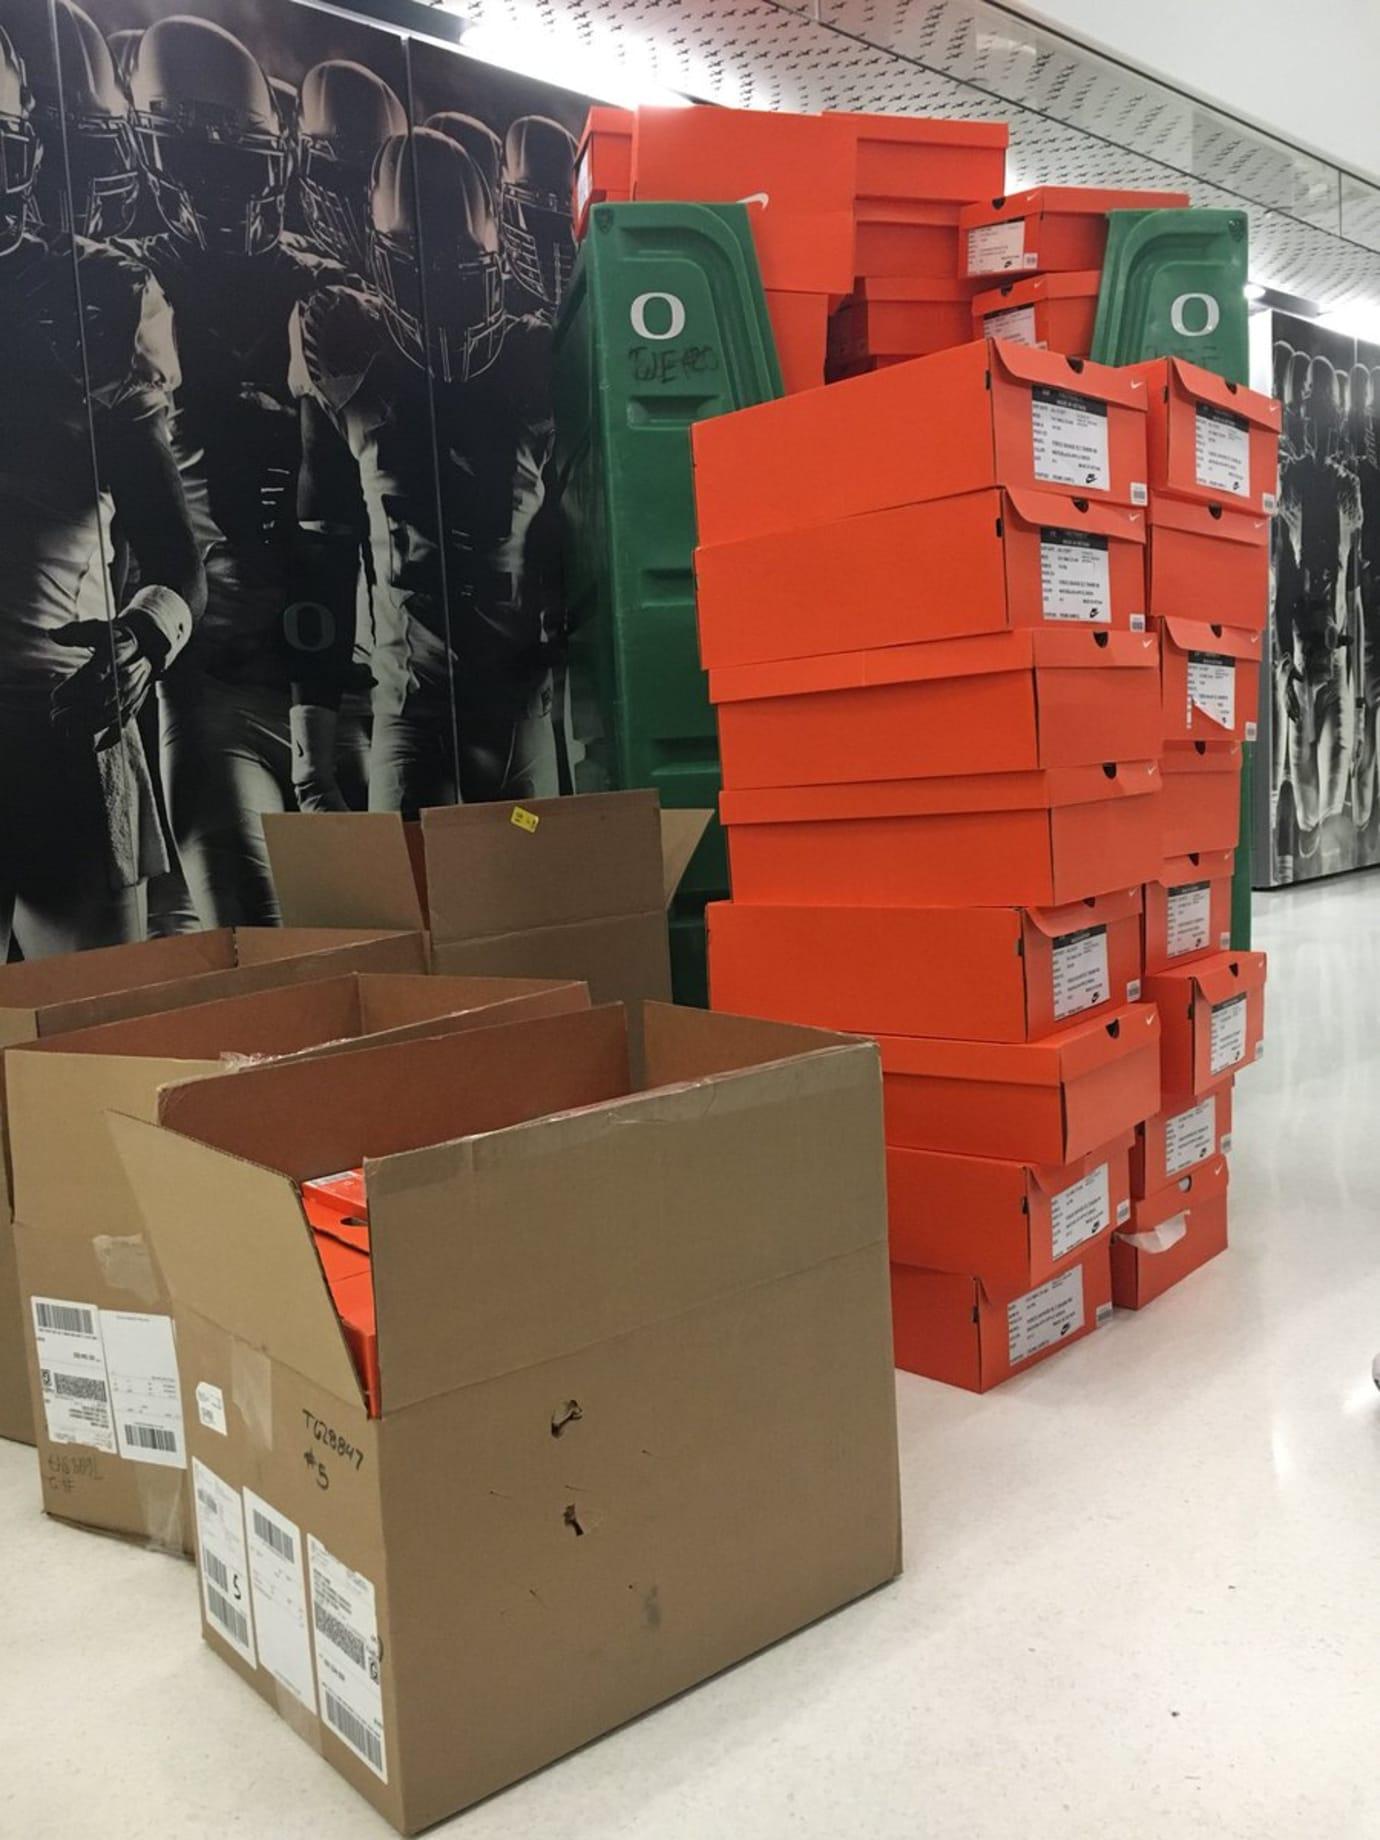 Oregon Ducks Surplus Sale 2018 Sneakers